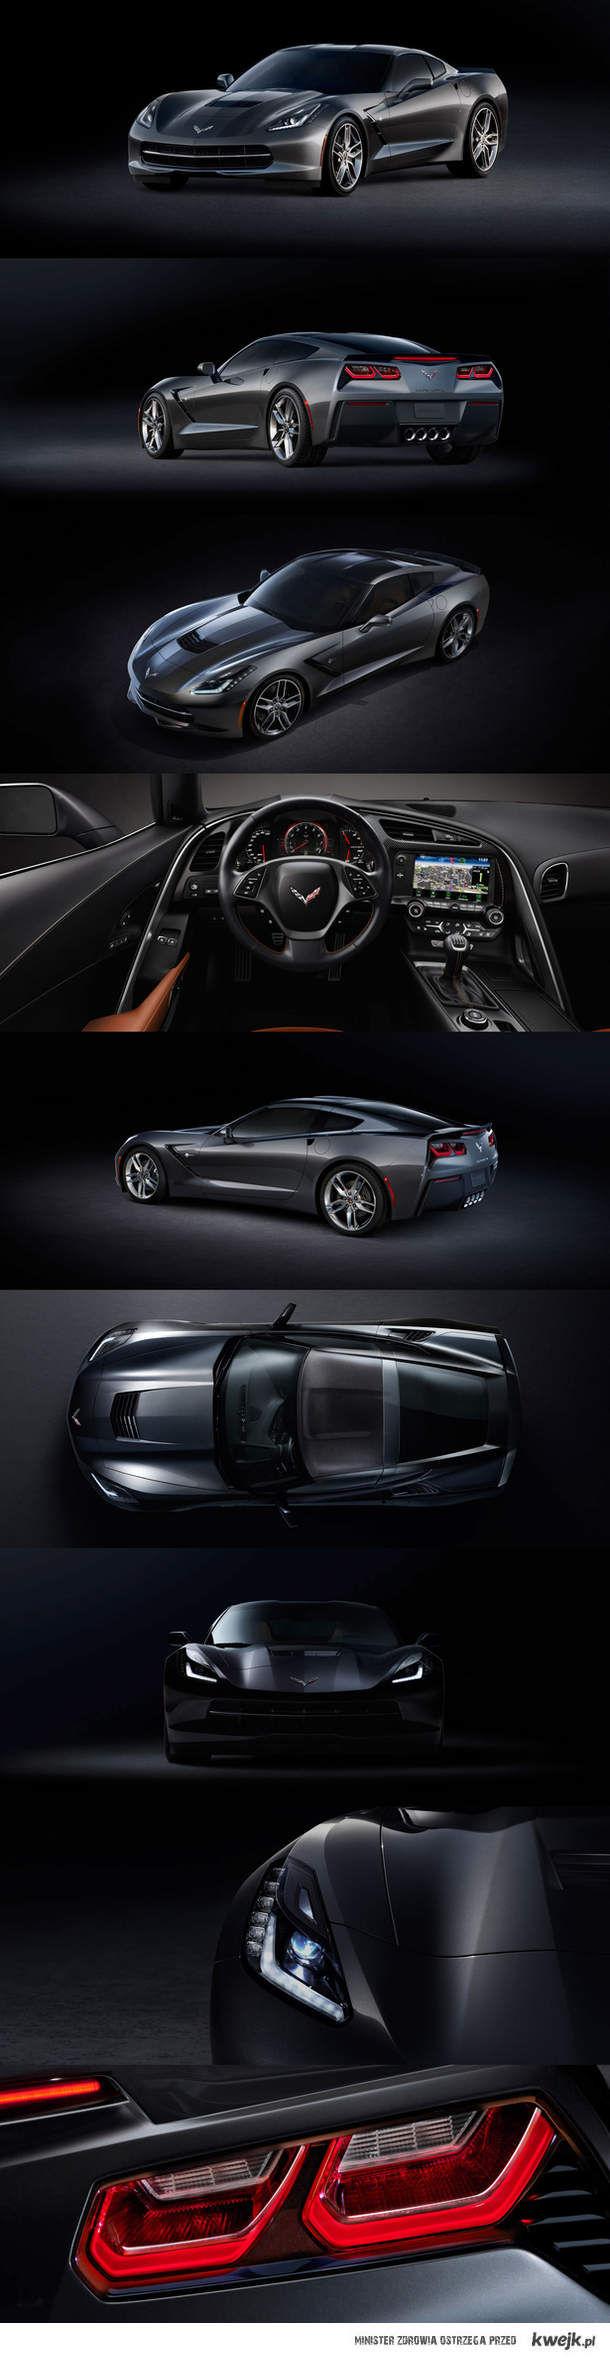 Nowa Corvette